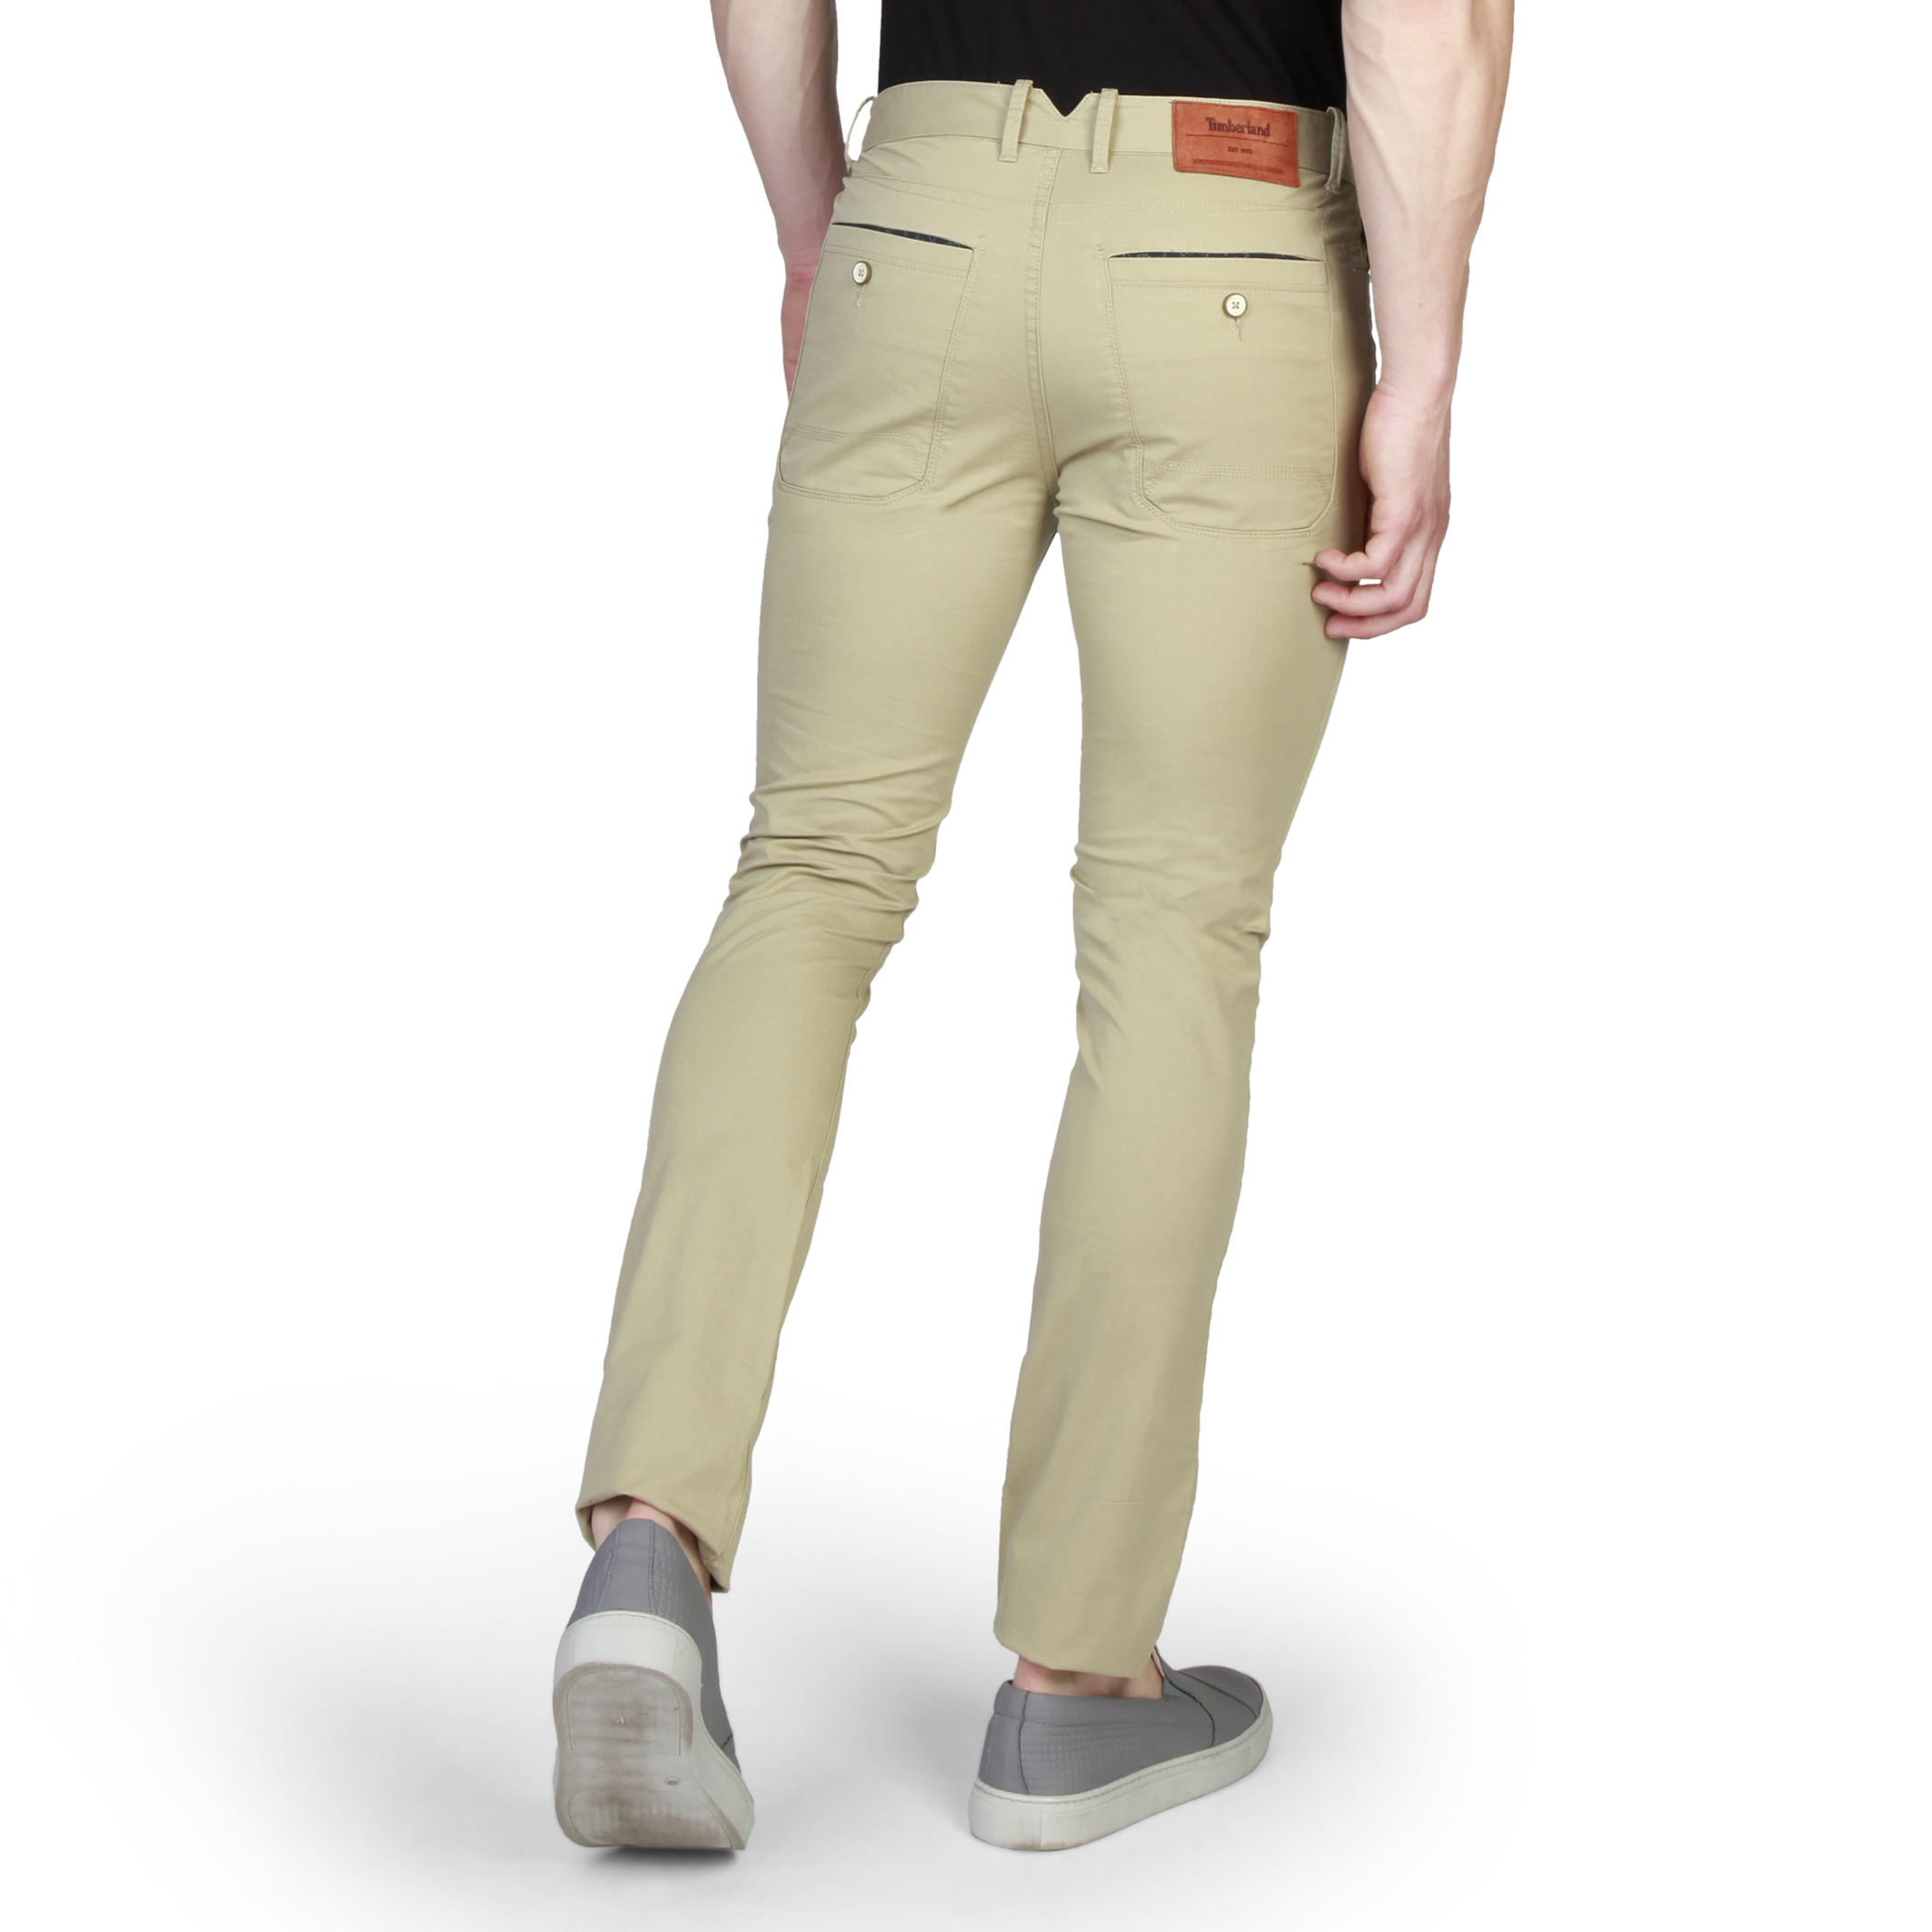 Pantalons chino/citadin  Timberland A1563 brown